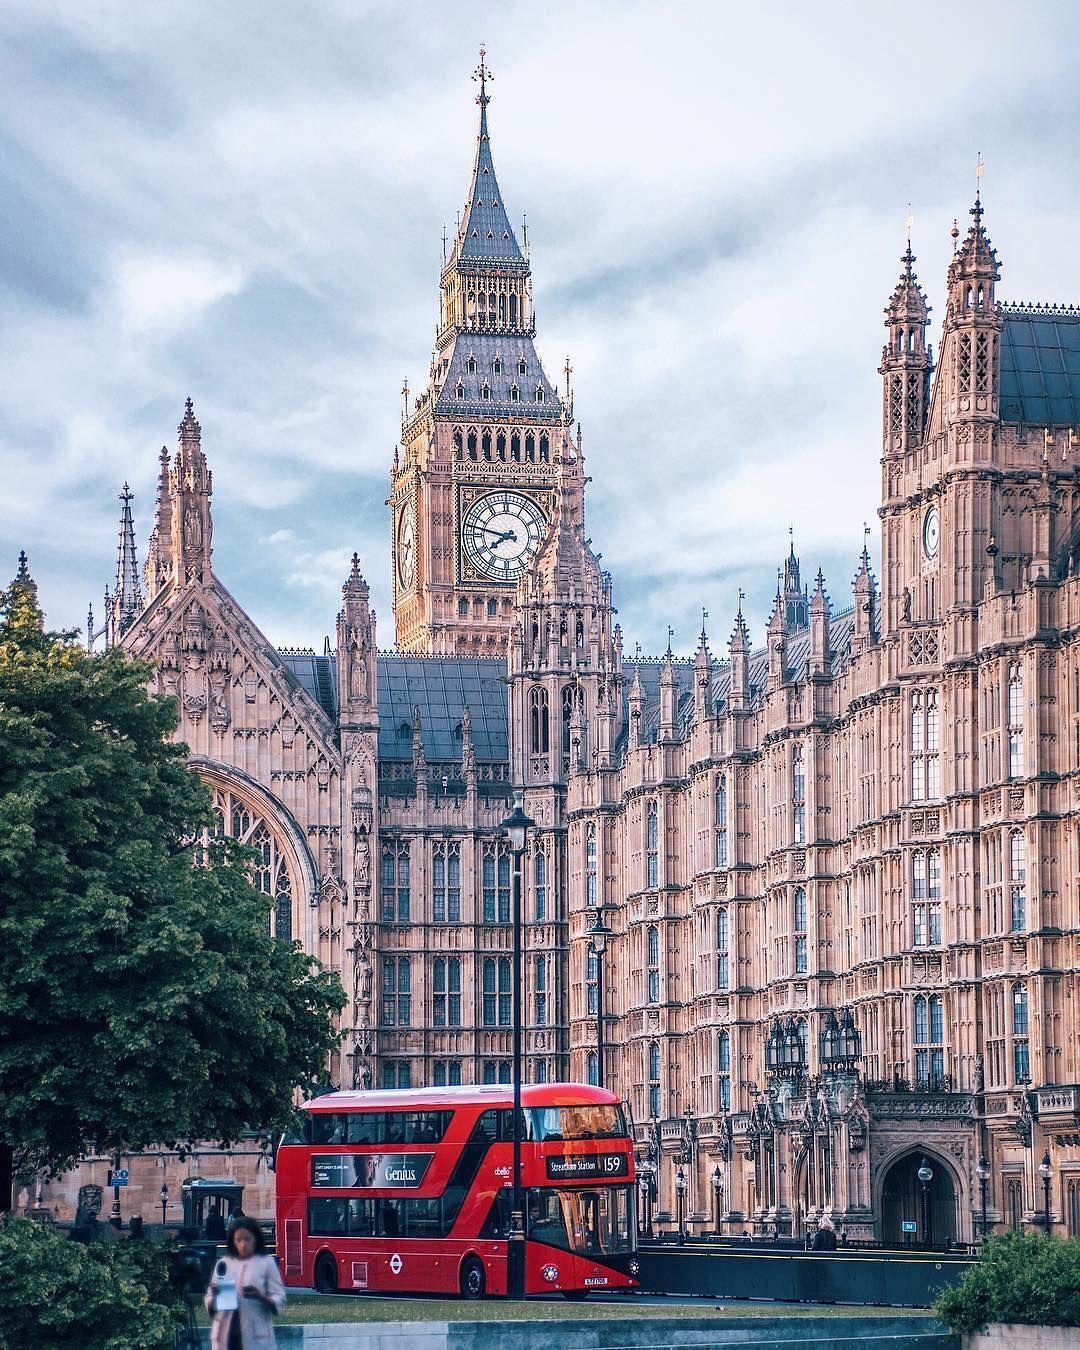 Pin by Brenda Chico on London 2021 in 2020 London